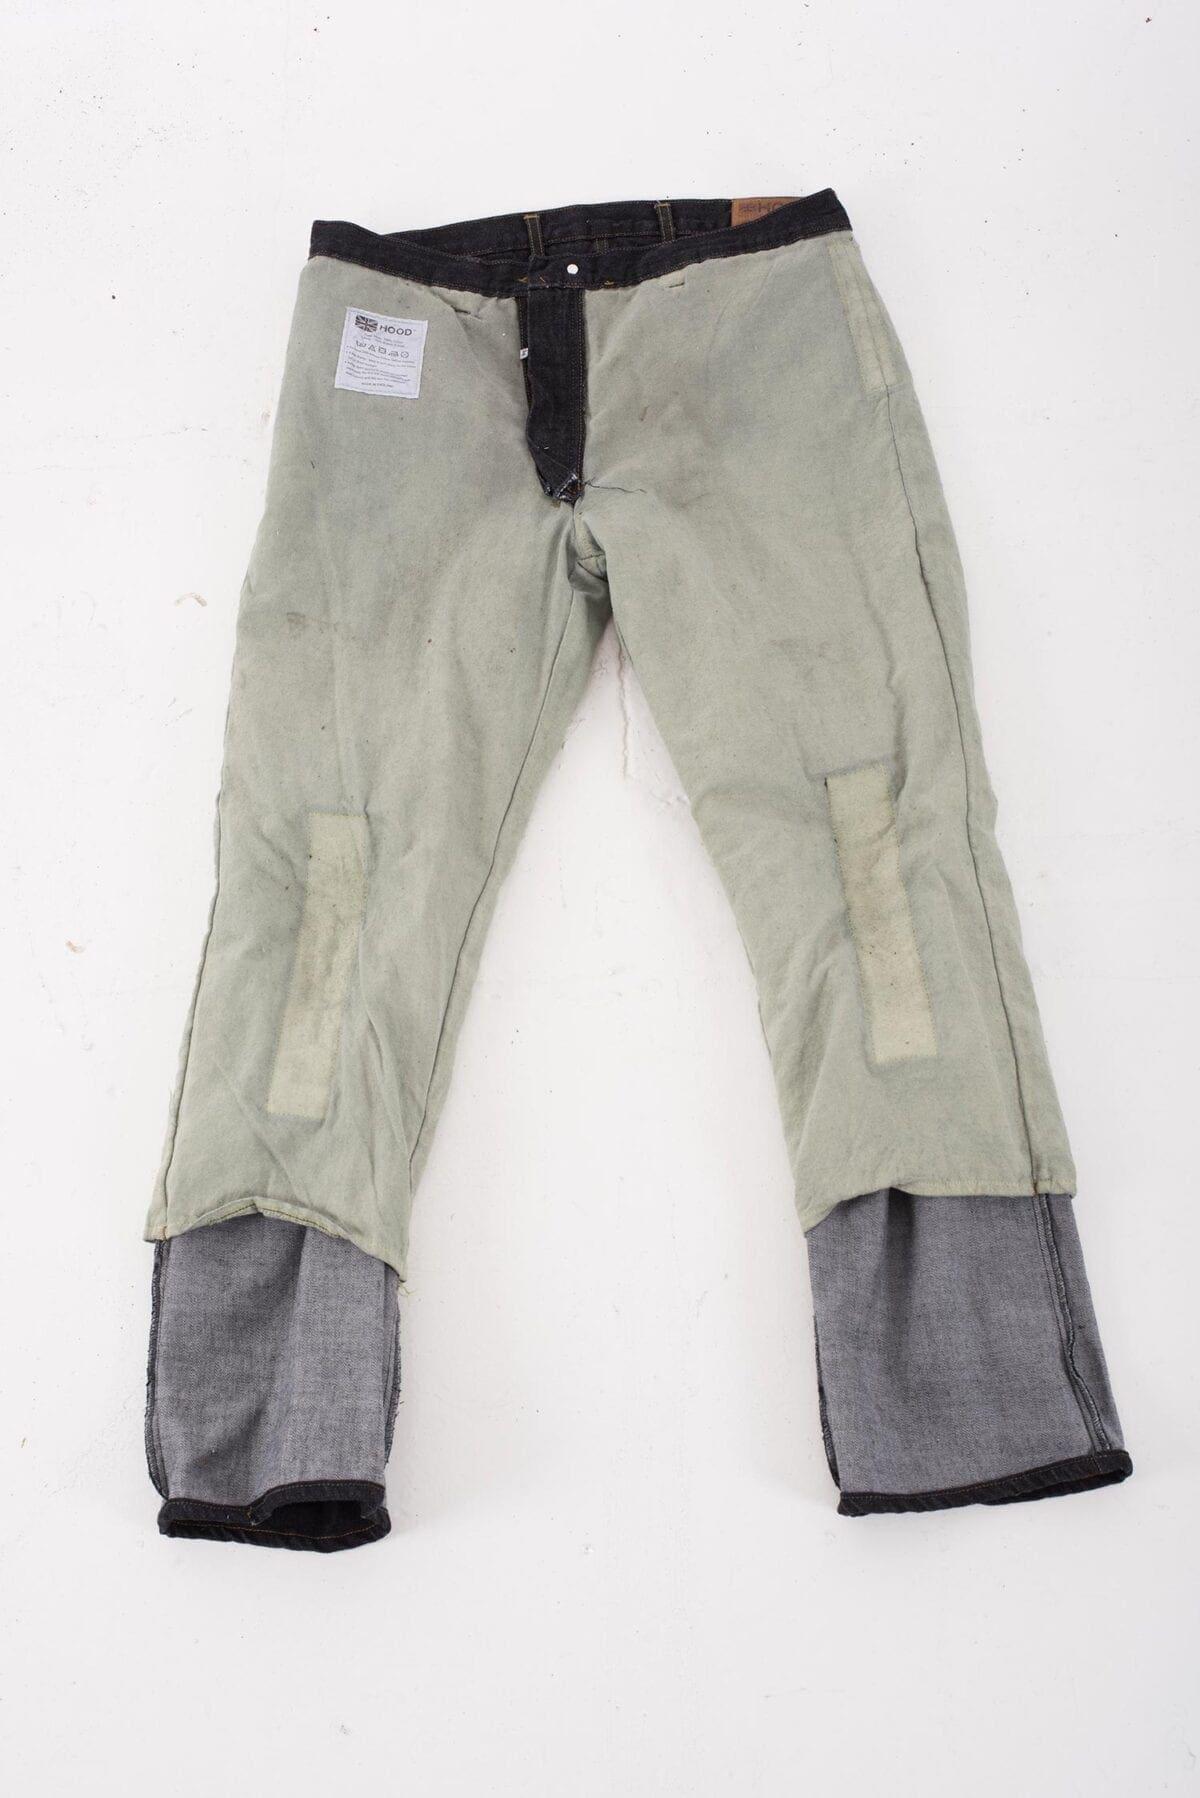 084_Hood-K7-para-aramid-jeans-014